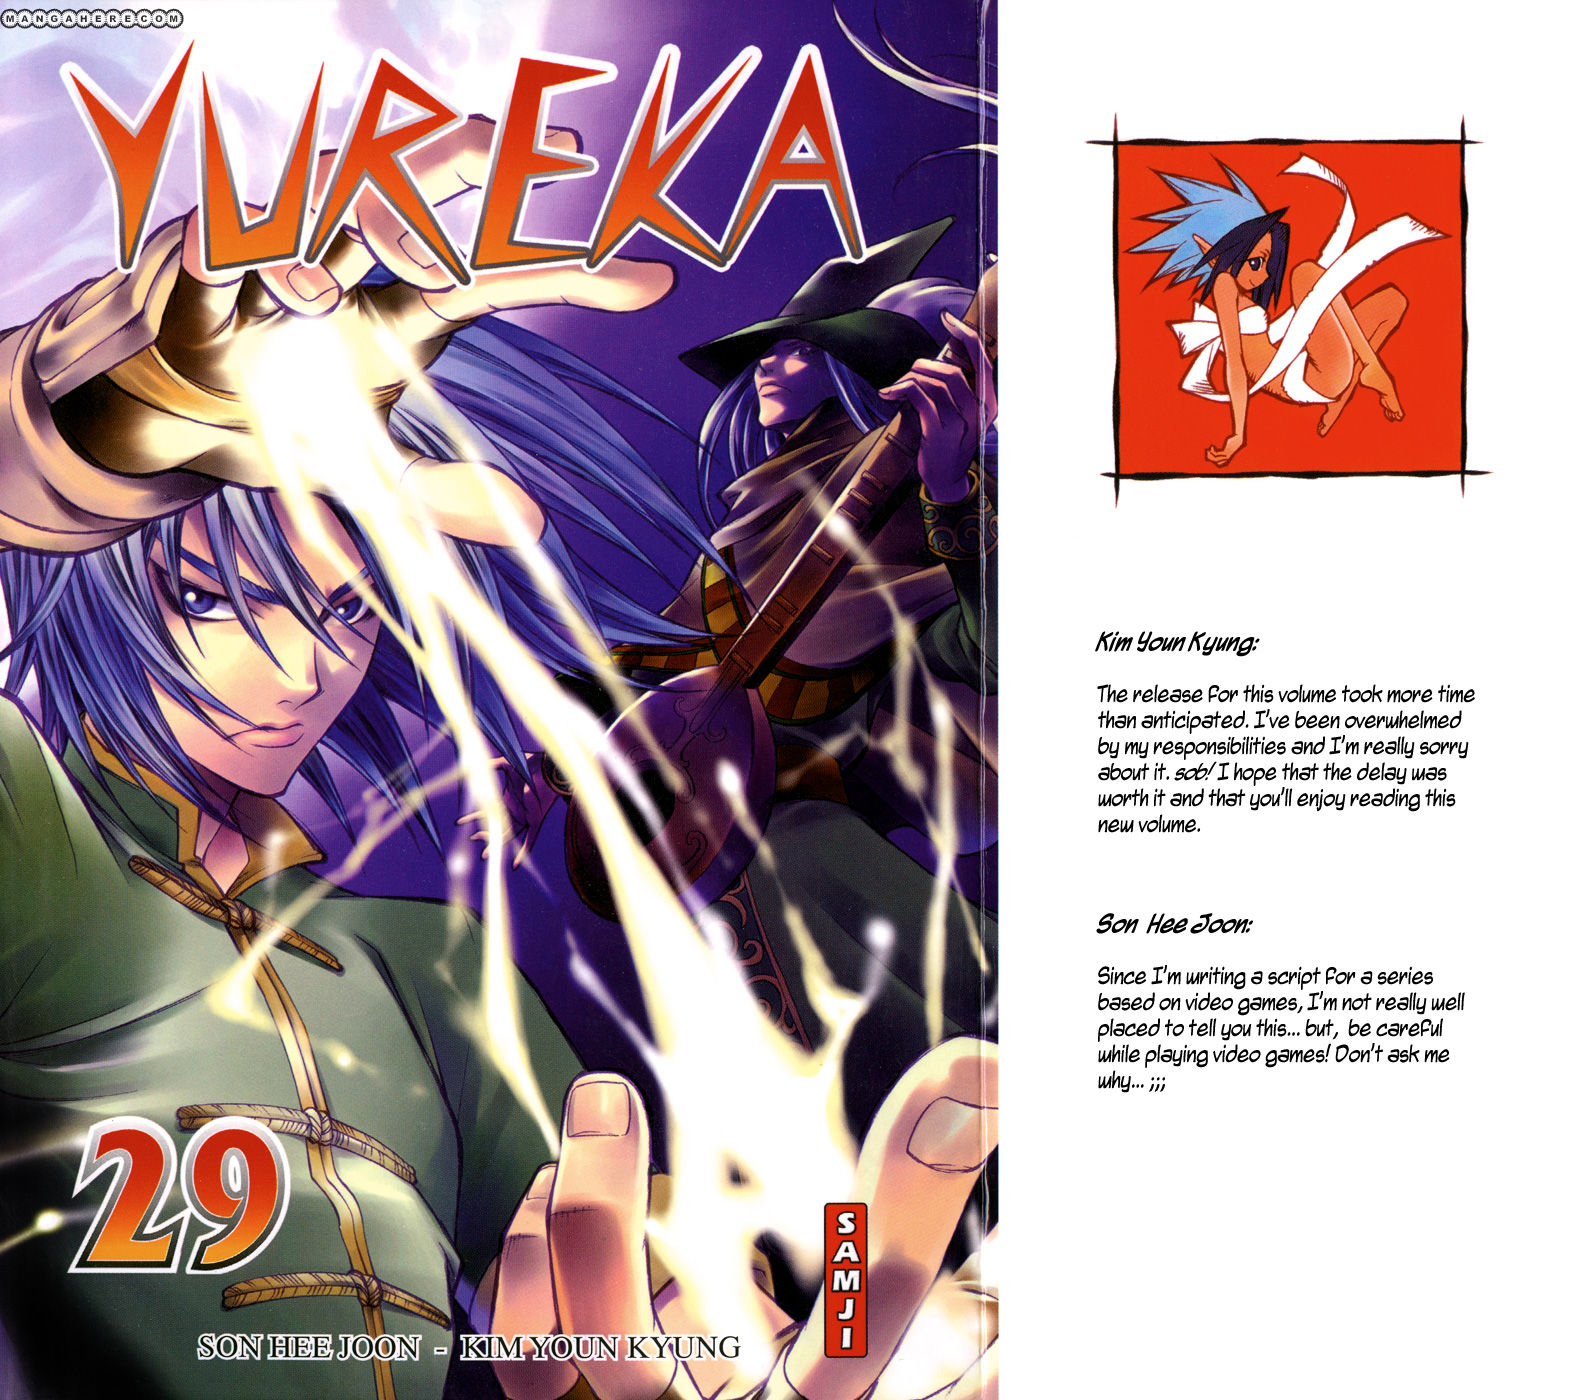 Yureka 176 Page 2